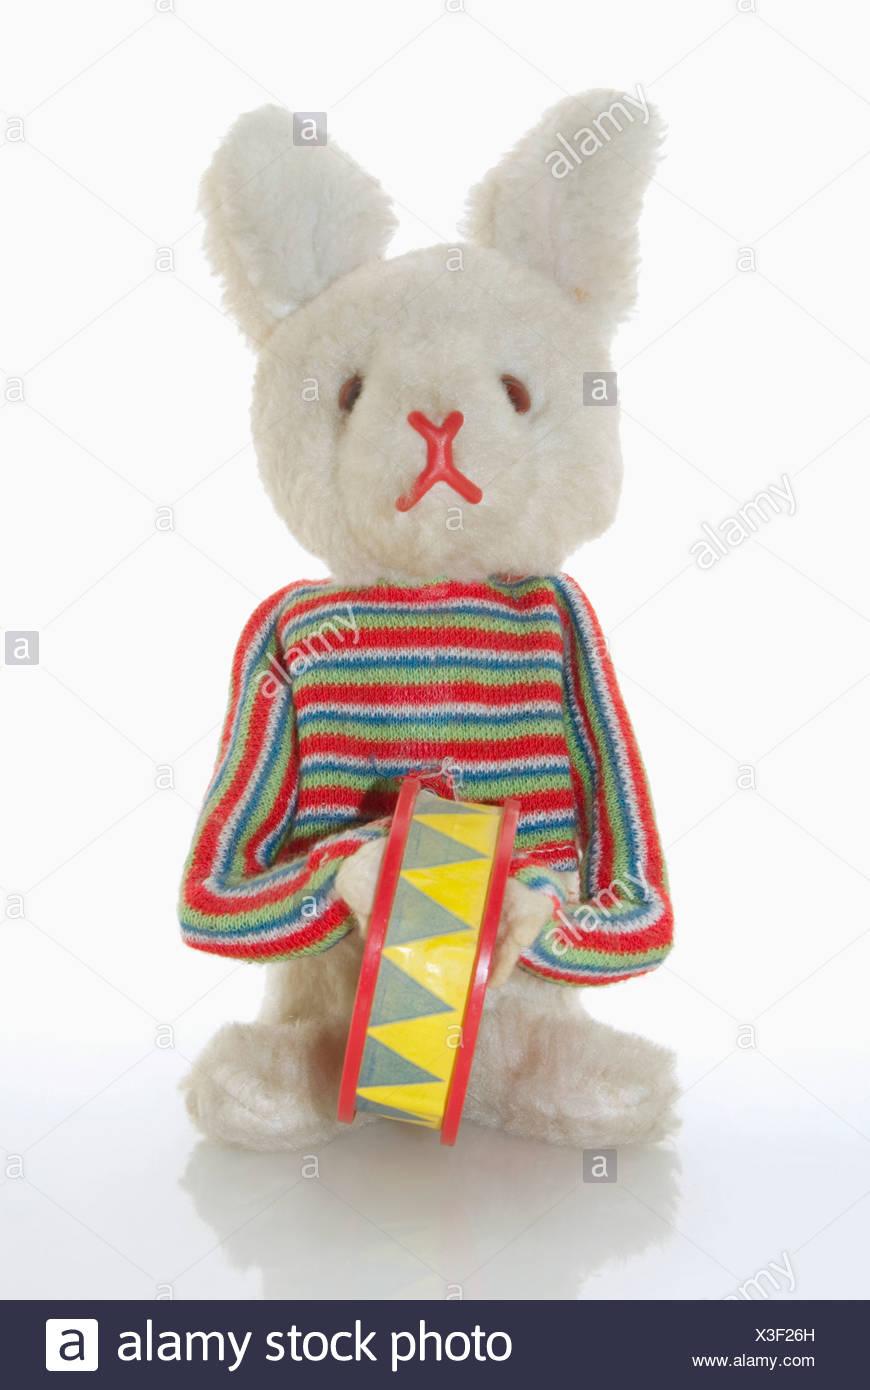 Toy bunny, close-up Photo Stock